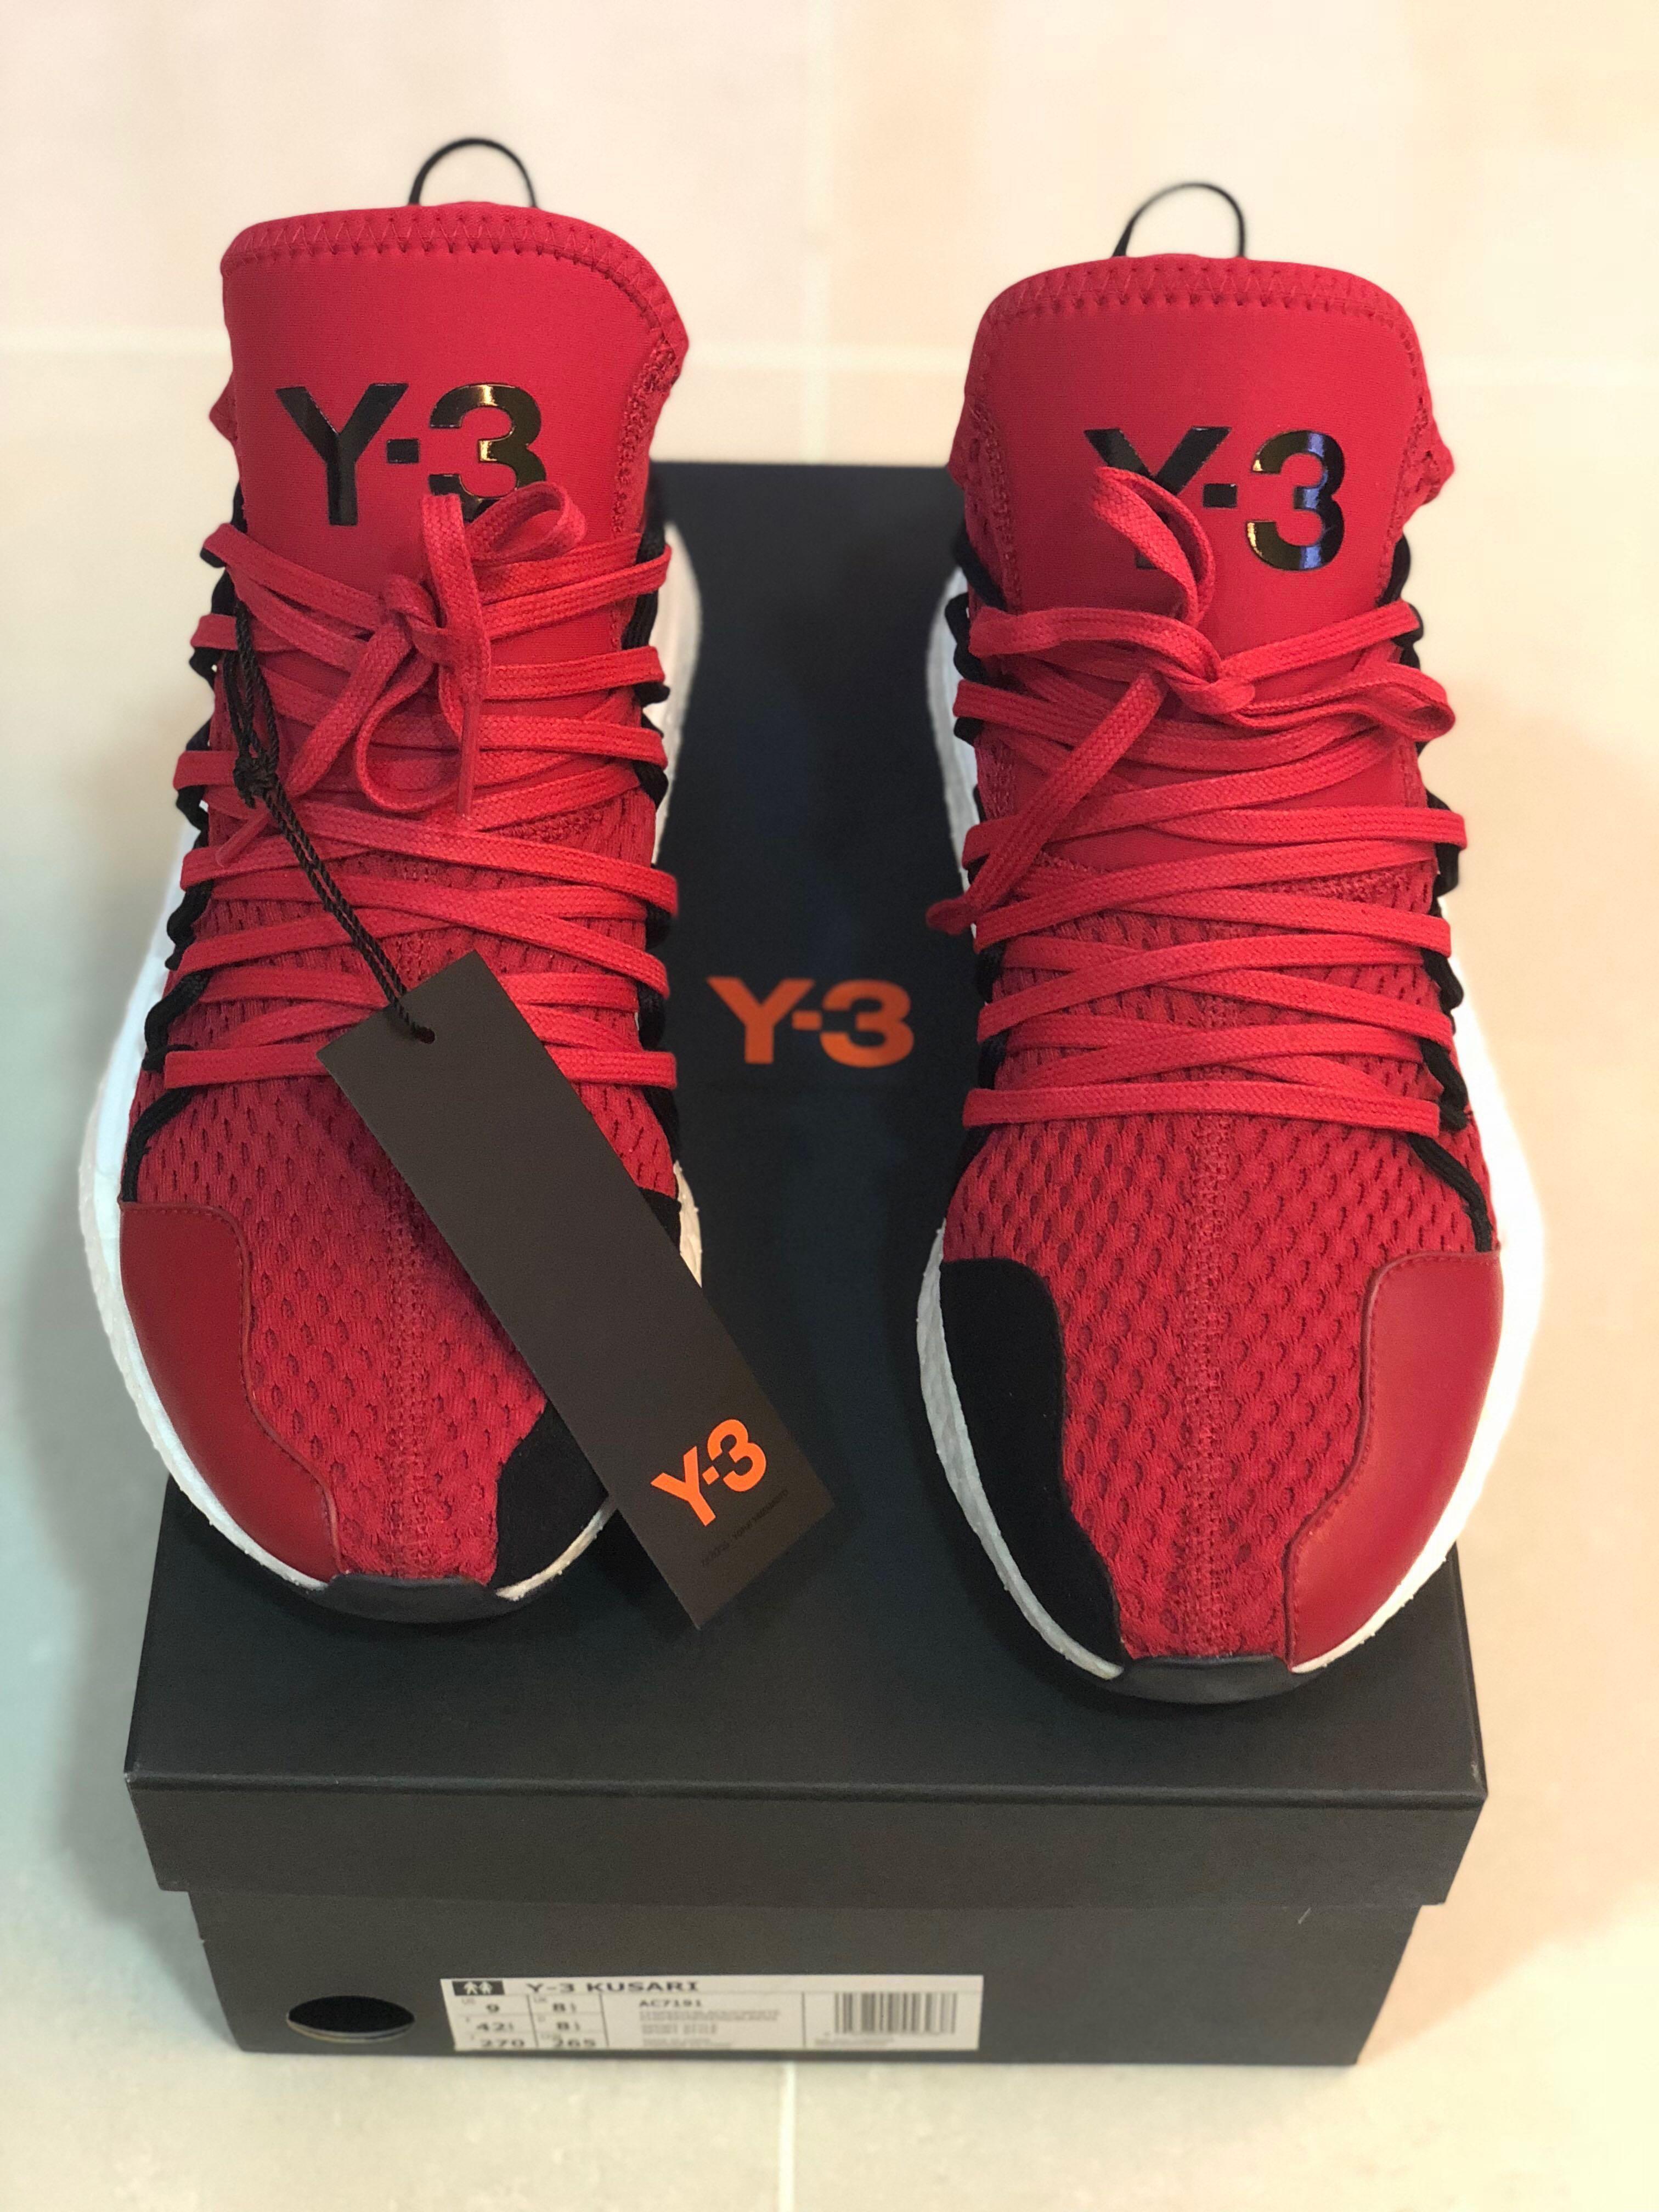 c6d69debd Y-3 Yohji Yamamoto Kusari Red Sneaker